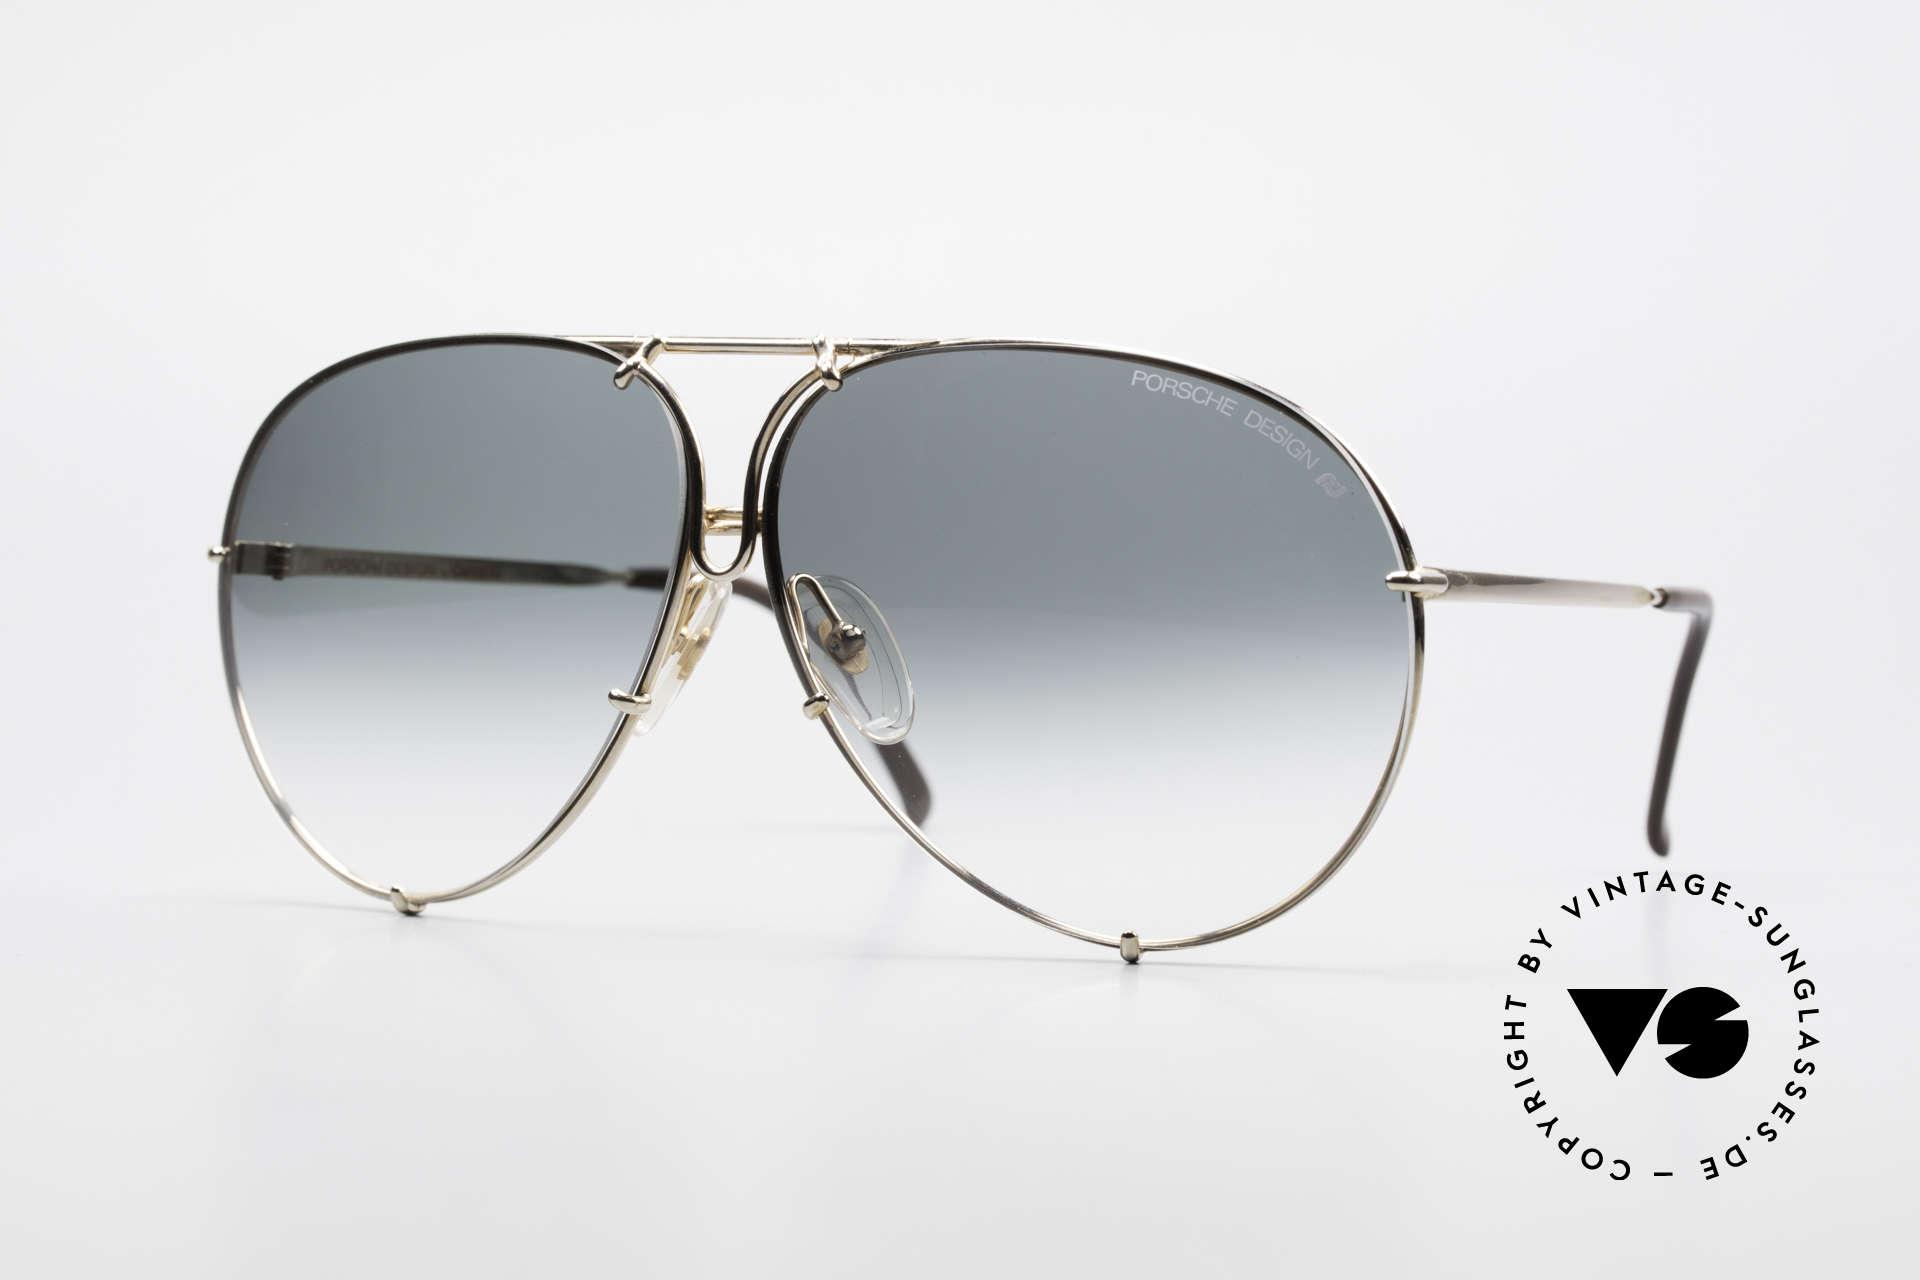 Porsche 5623 Black Mass Movie Sunglasses, vintage Porsche Design by Carrera shades from 1987, Made for Men and Women